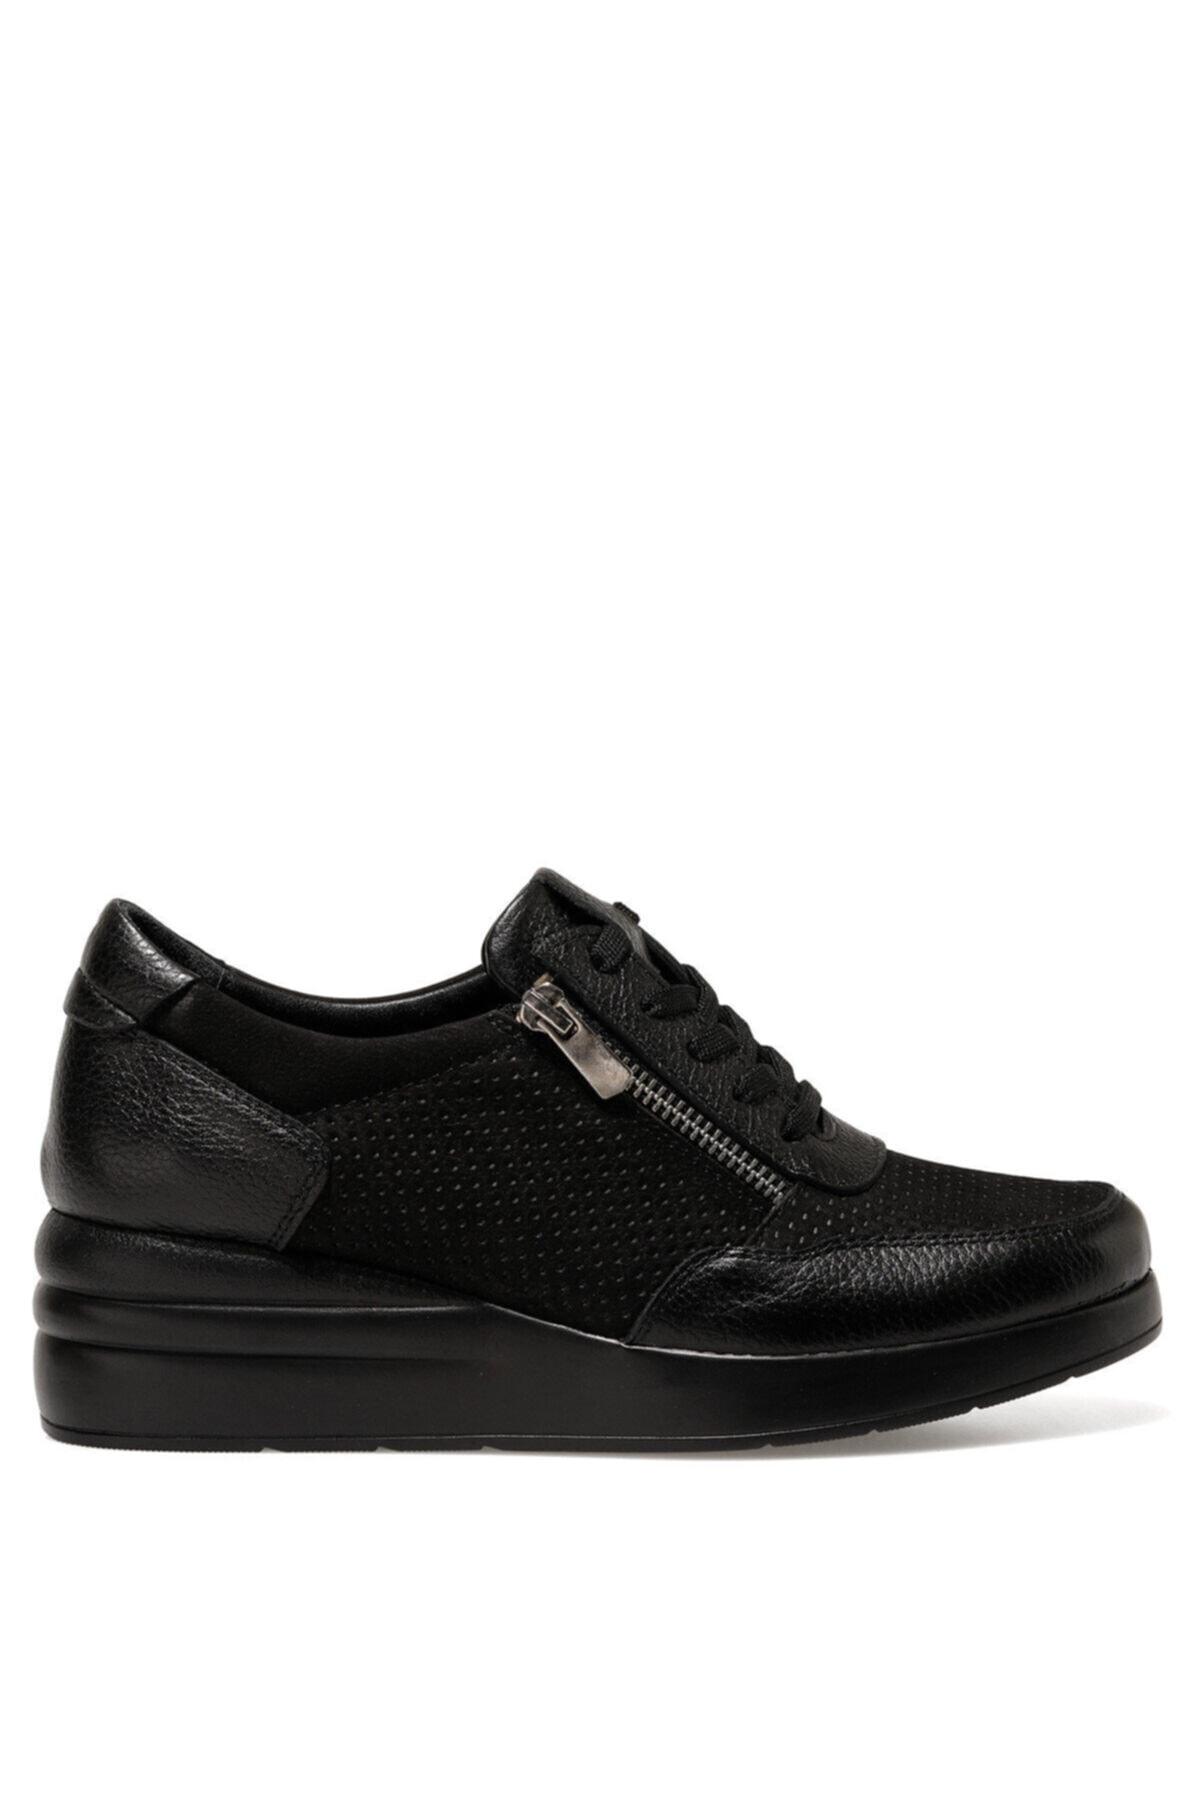 İnci SALVATORE Siyah Kadın Comfort Ayakkabı 101025975 1